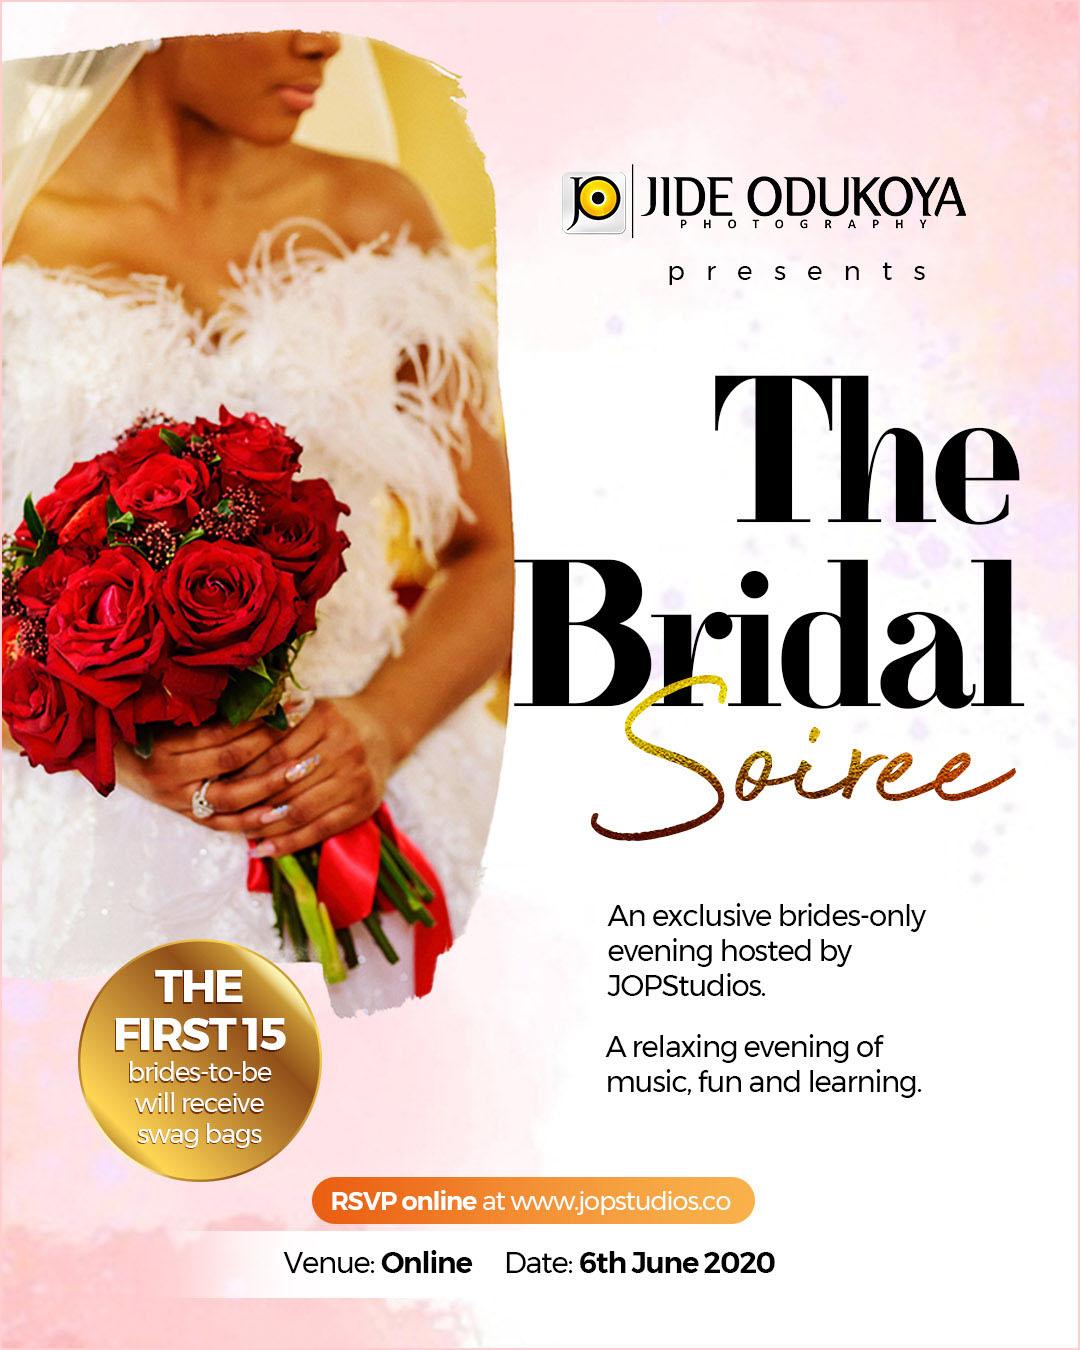 JOPStudios Bridal Soiree in June 2020